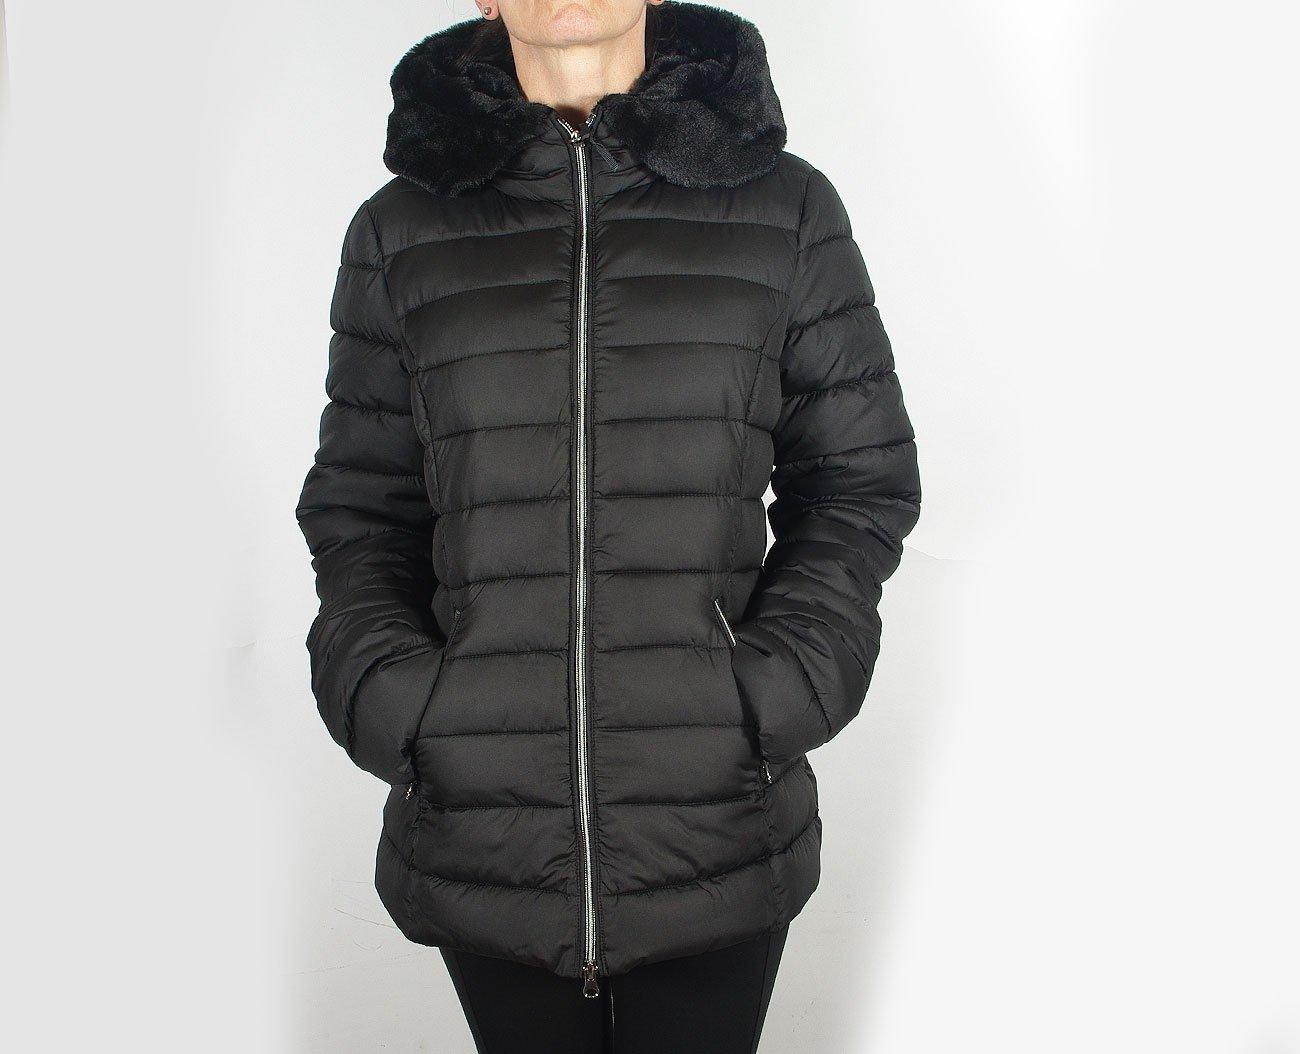 Evita Cloe kurtka microfibra czarny